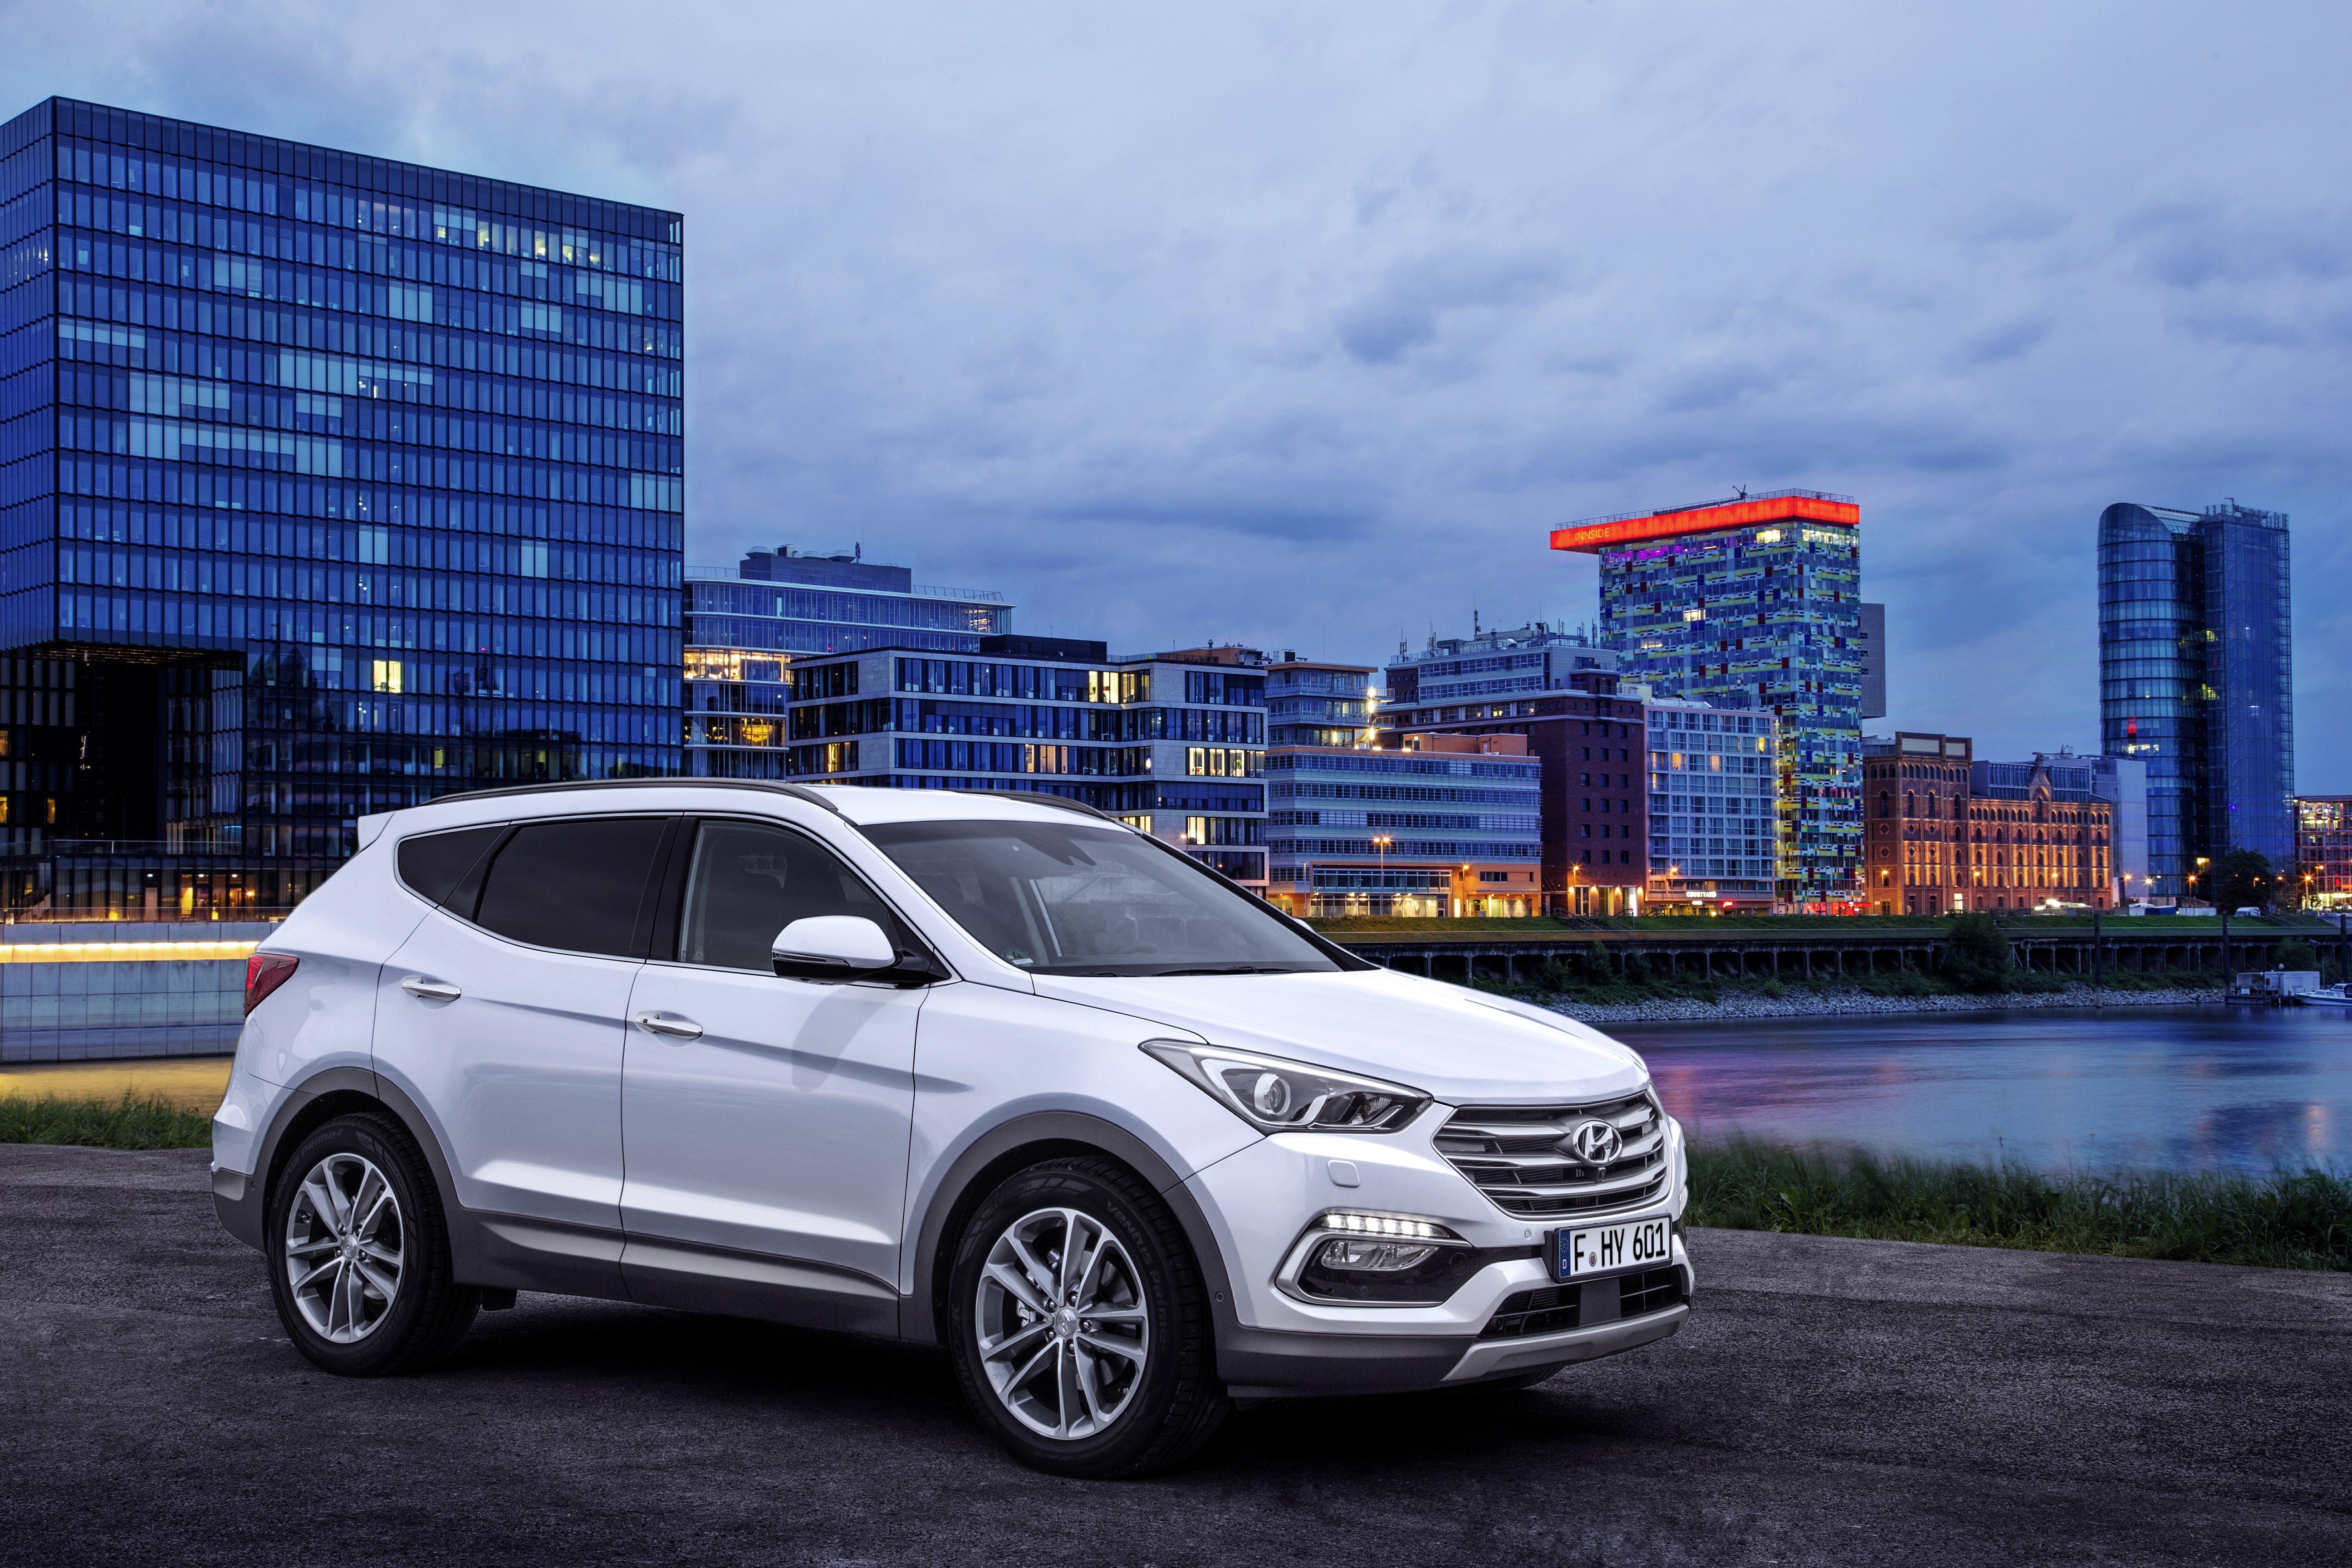 Hyundai santa fe suv harman original resolution biocorpaavc Images